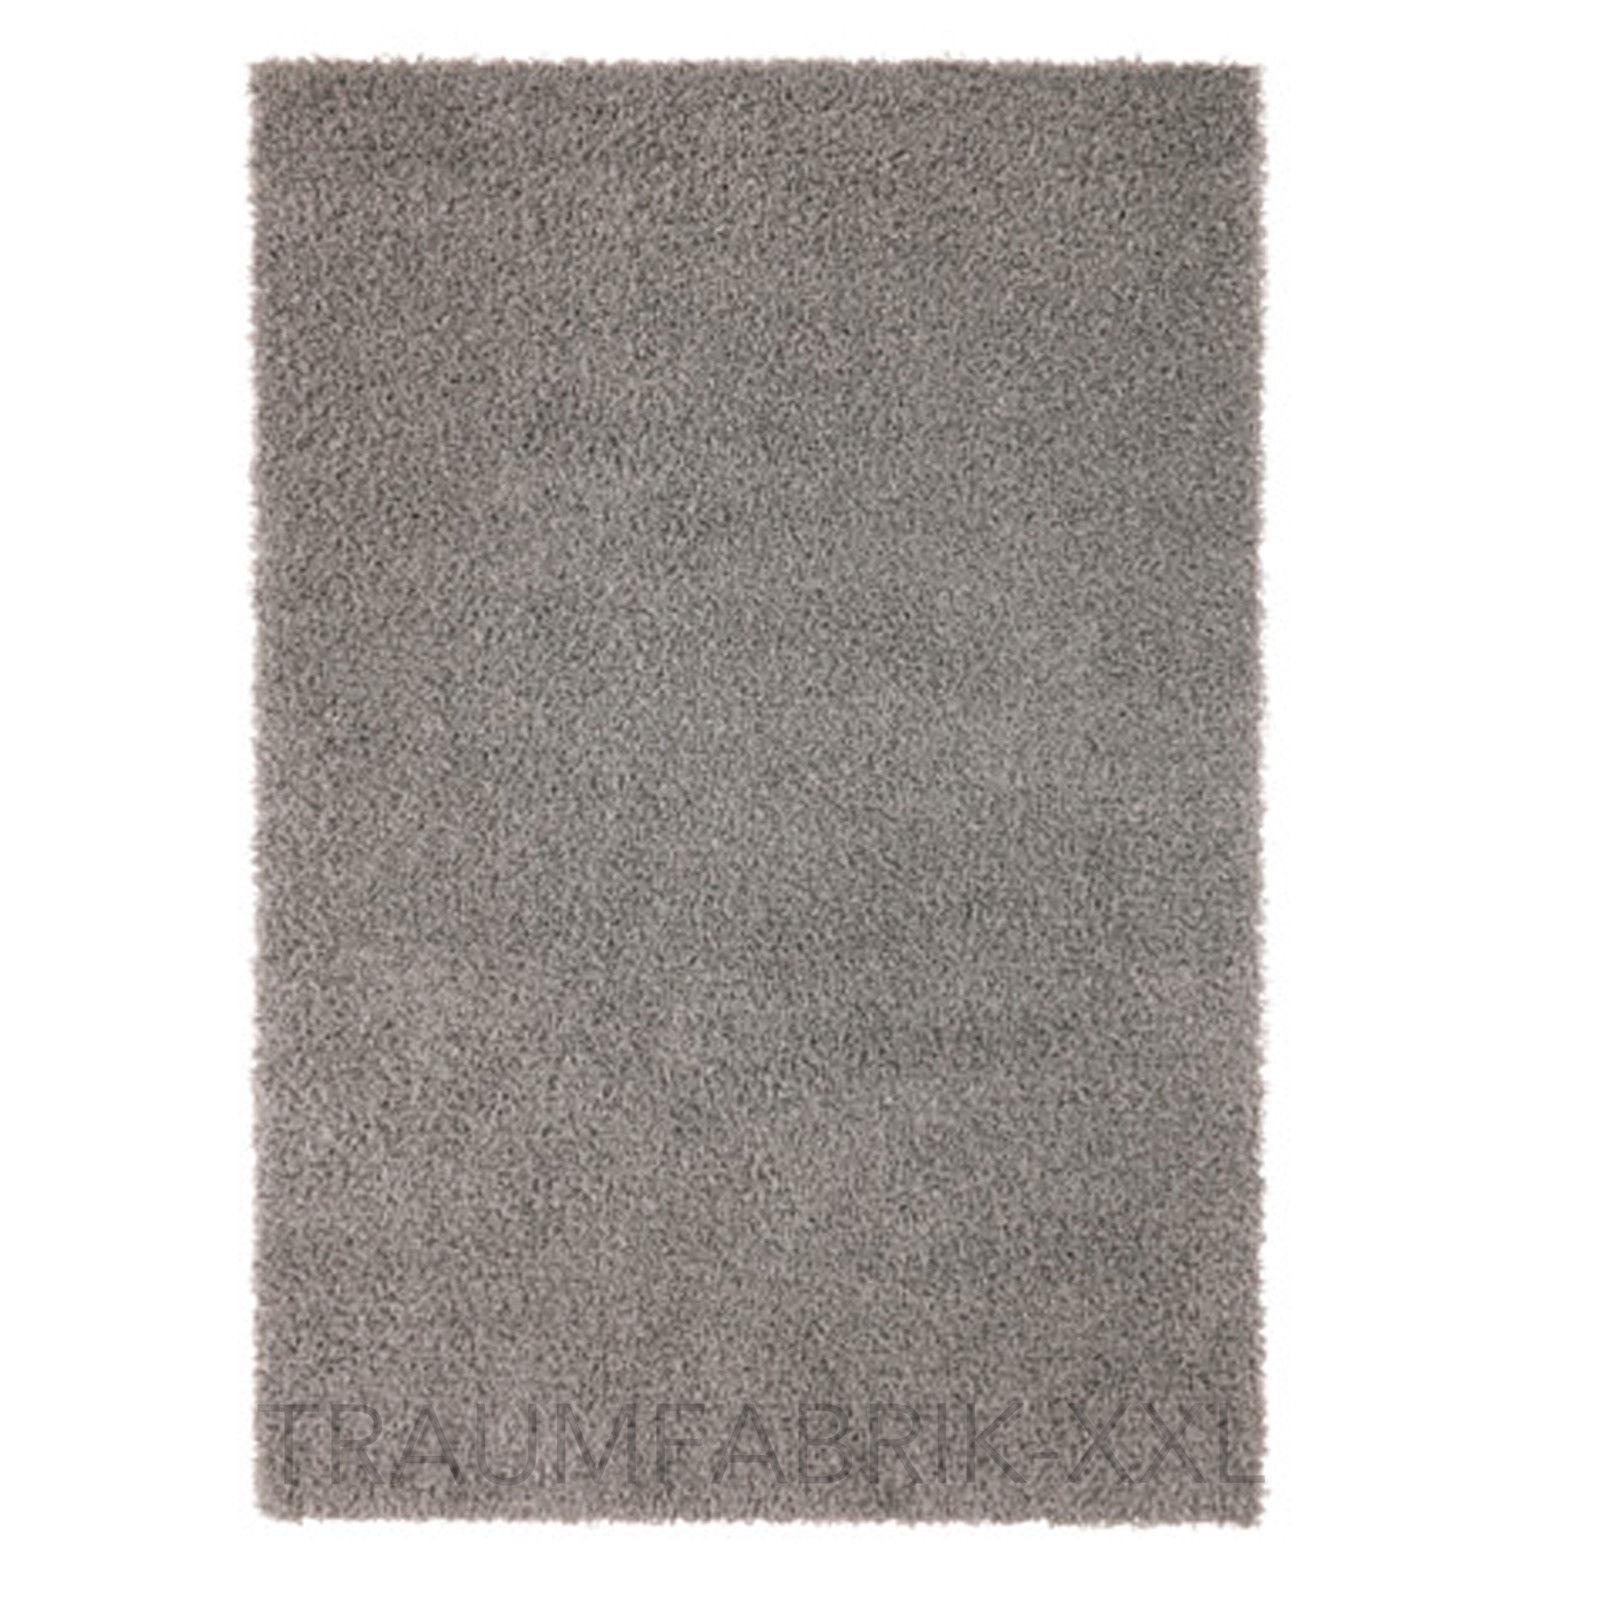 teppich langflor beige beautiful kibek teppiche berlin tolle hochflor teppich langflor teppich. Black Bedroom Furniture Sets. Home Design Ideas